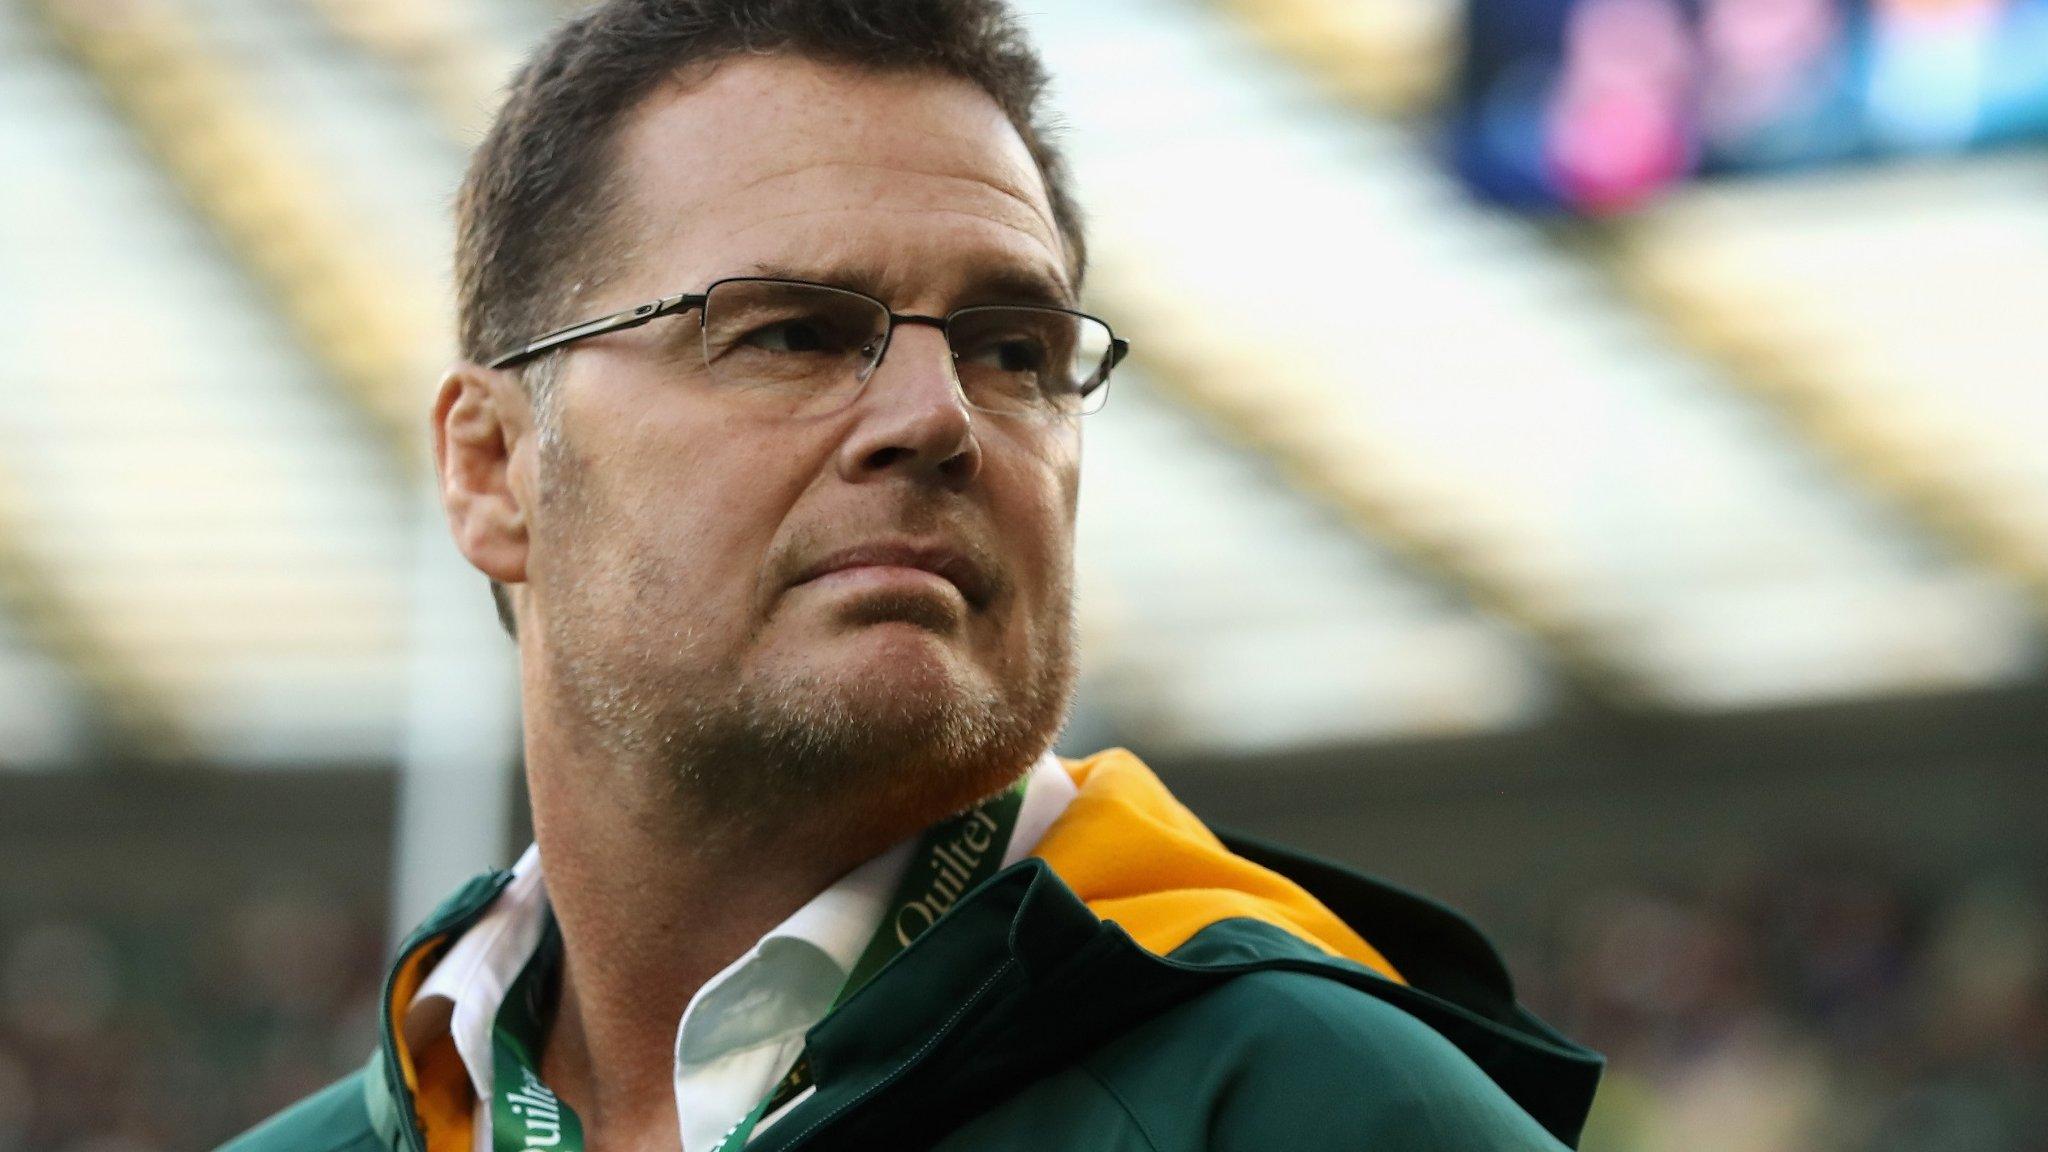 Wales v South Africa: Springboks coach Erasmus expecting 'toughest test'